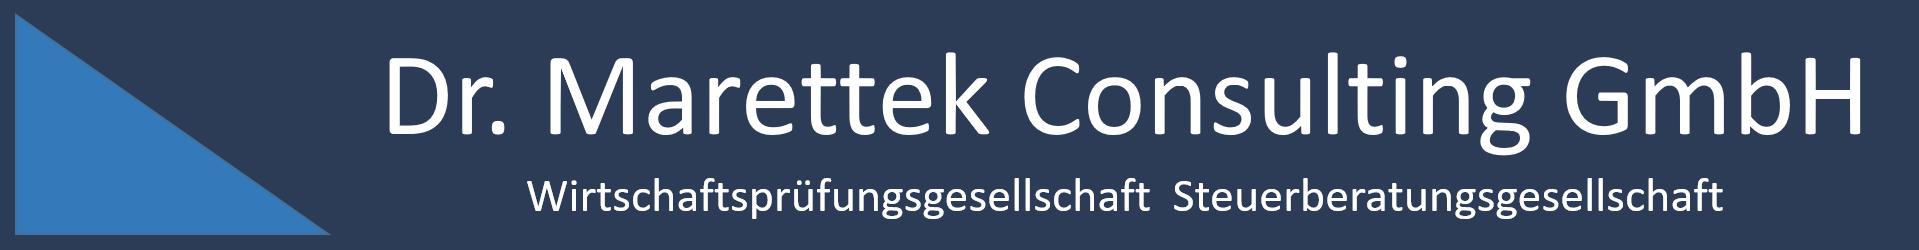 Dr. Marettek Consulting GmbH